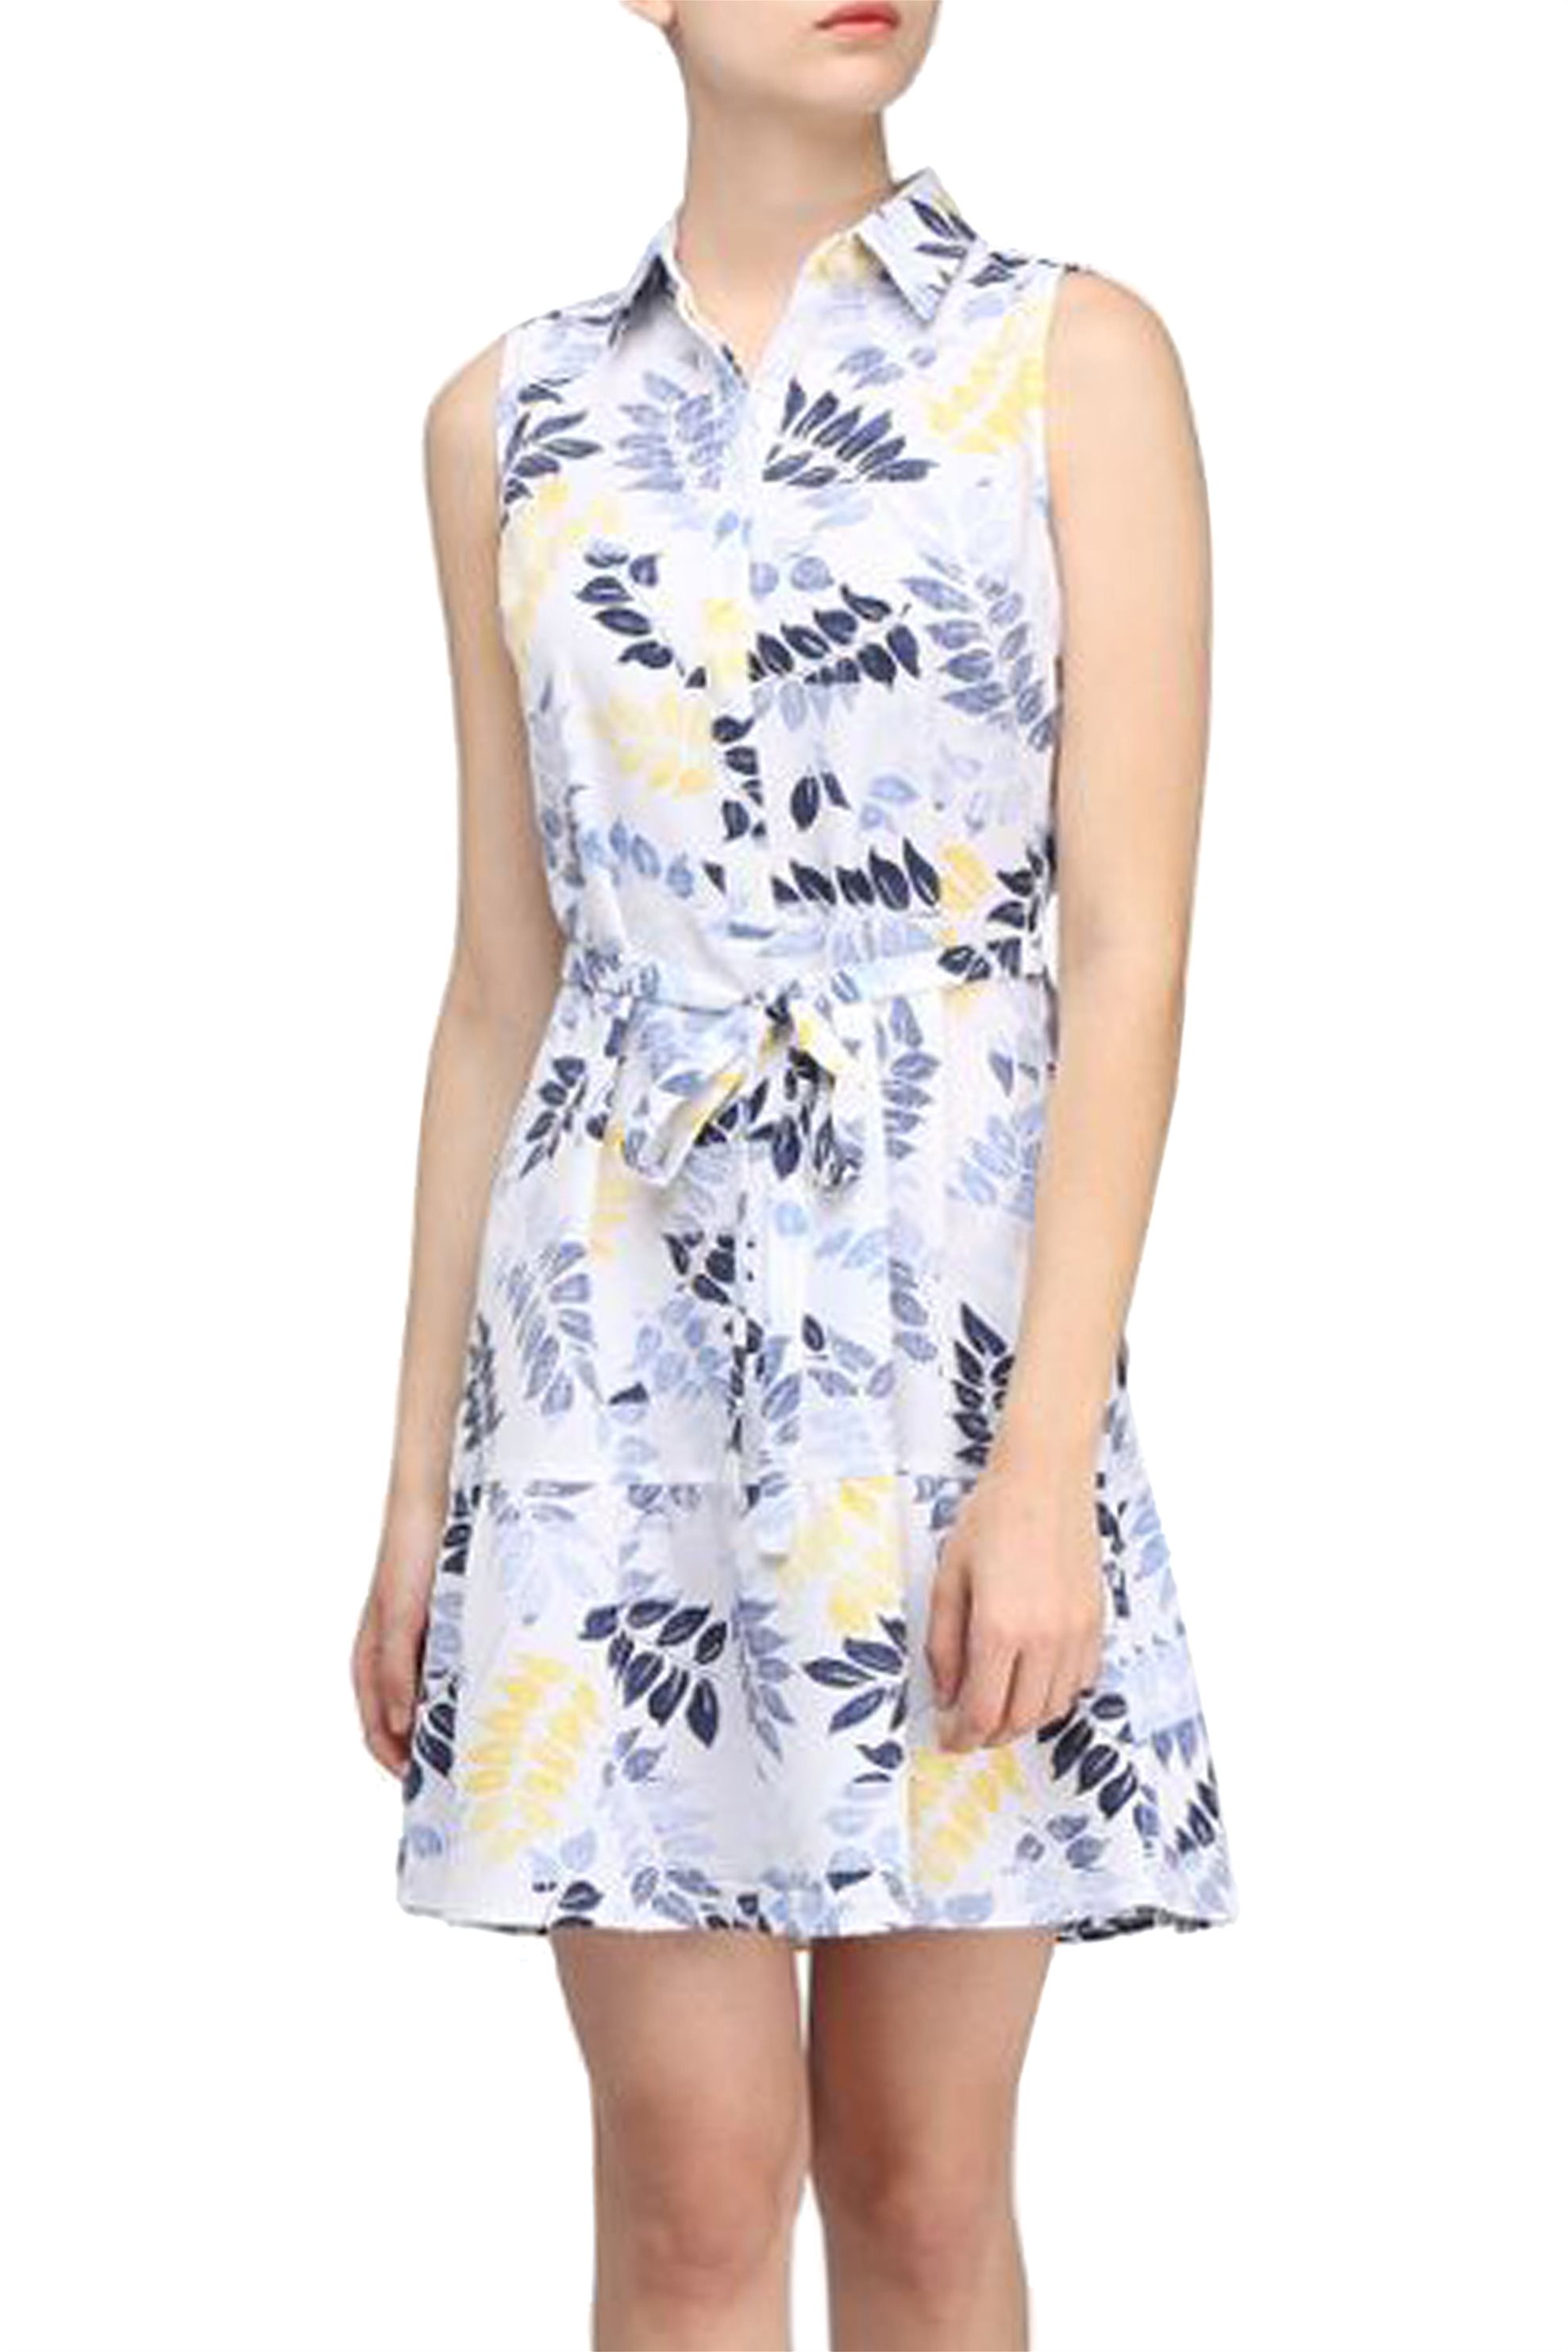 7255e1e59626 Γυναικεία   Ρούχα   Φορέματα   Καθημερινά   70062 NU Μίνι φόρεμα με ...